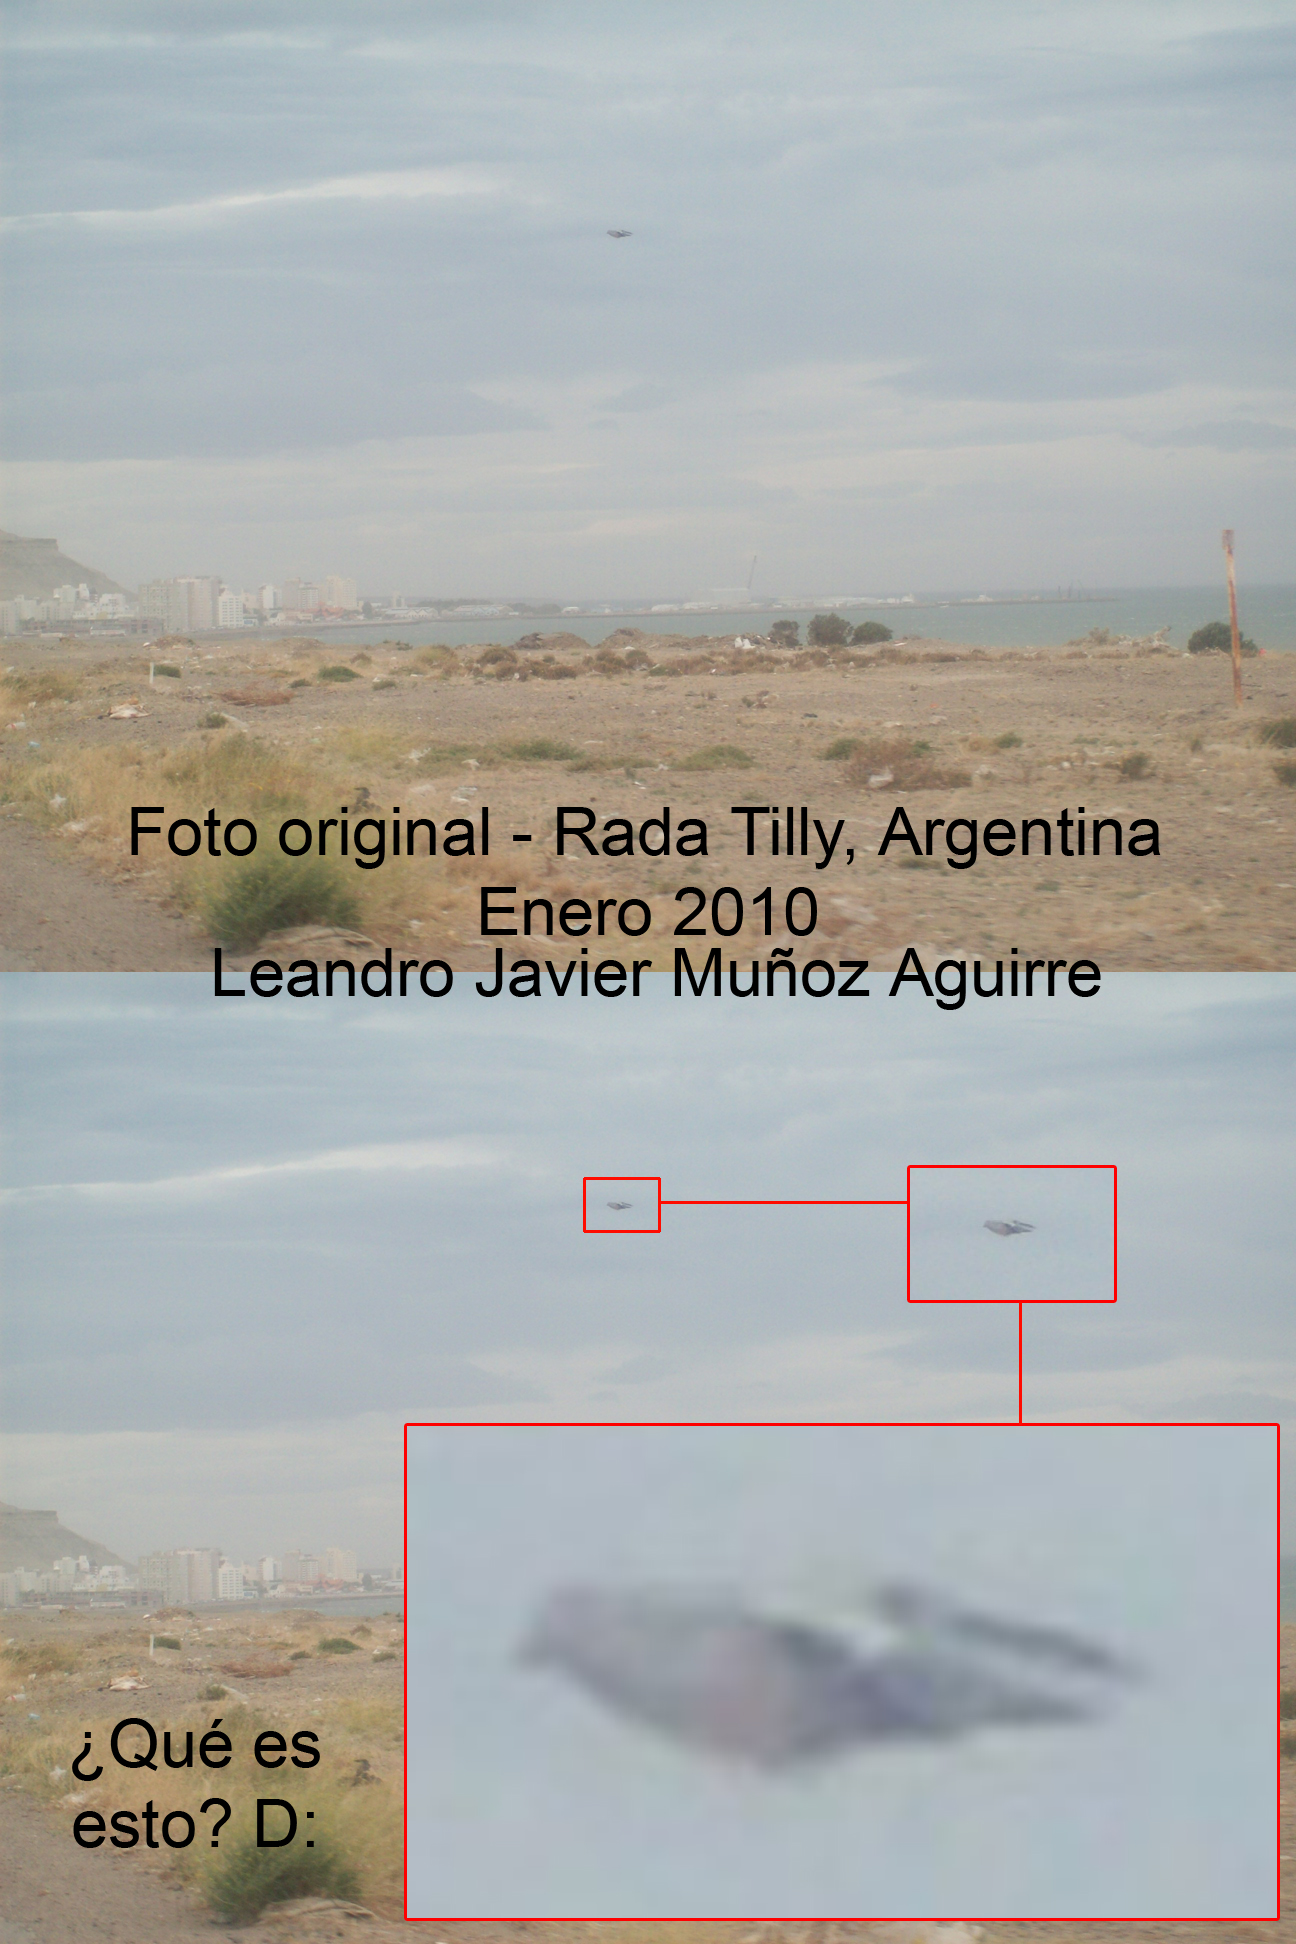 OVNI en Rada Tilly Argentina by rEaNzUrO